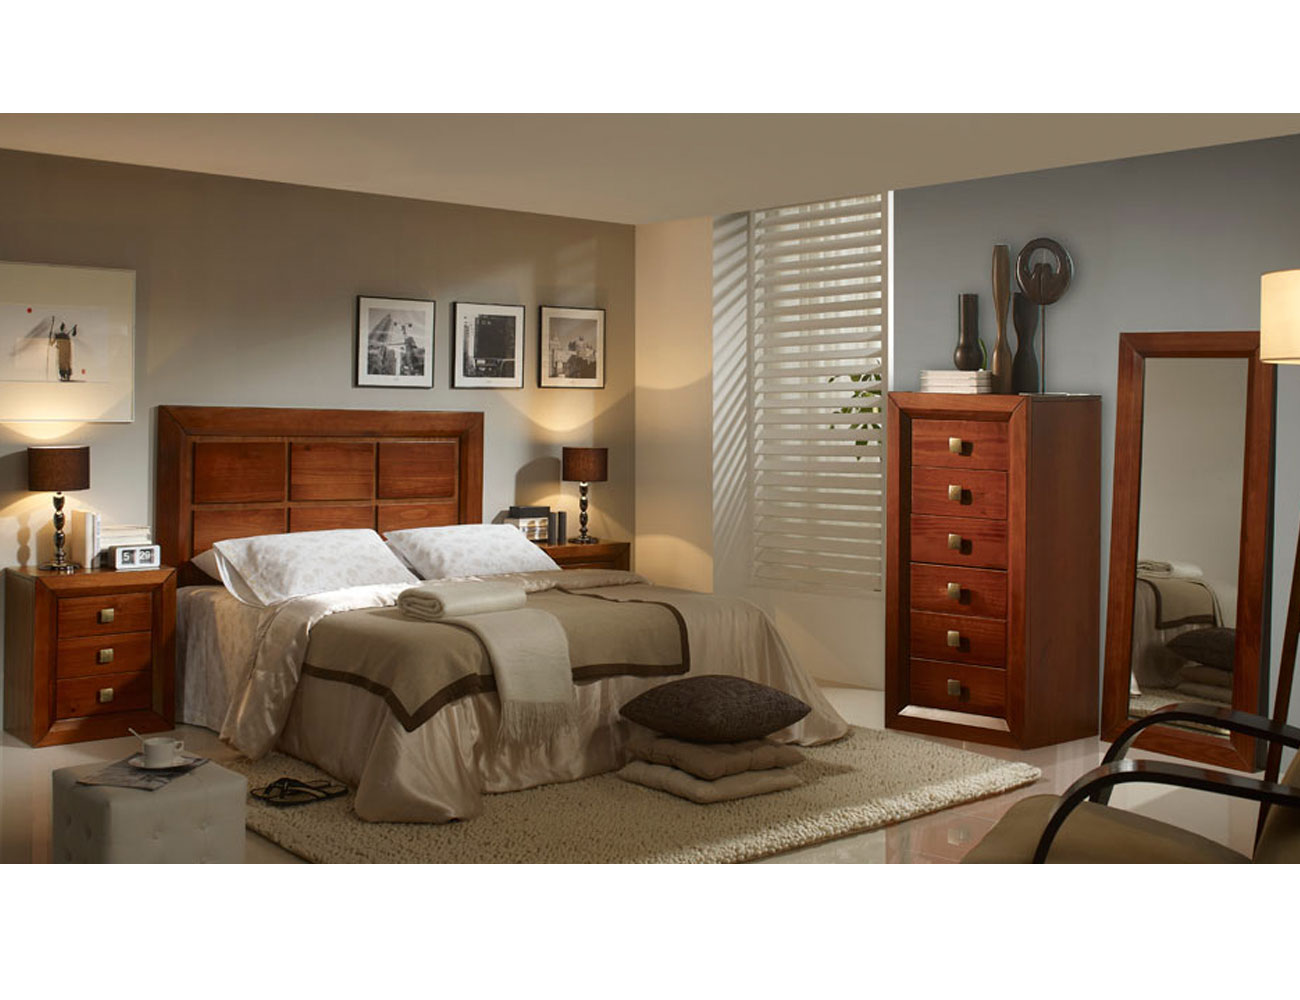 Dormitorio matrimonio sinfonier nogal madera dm4